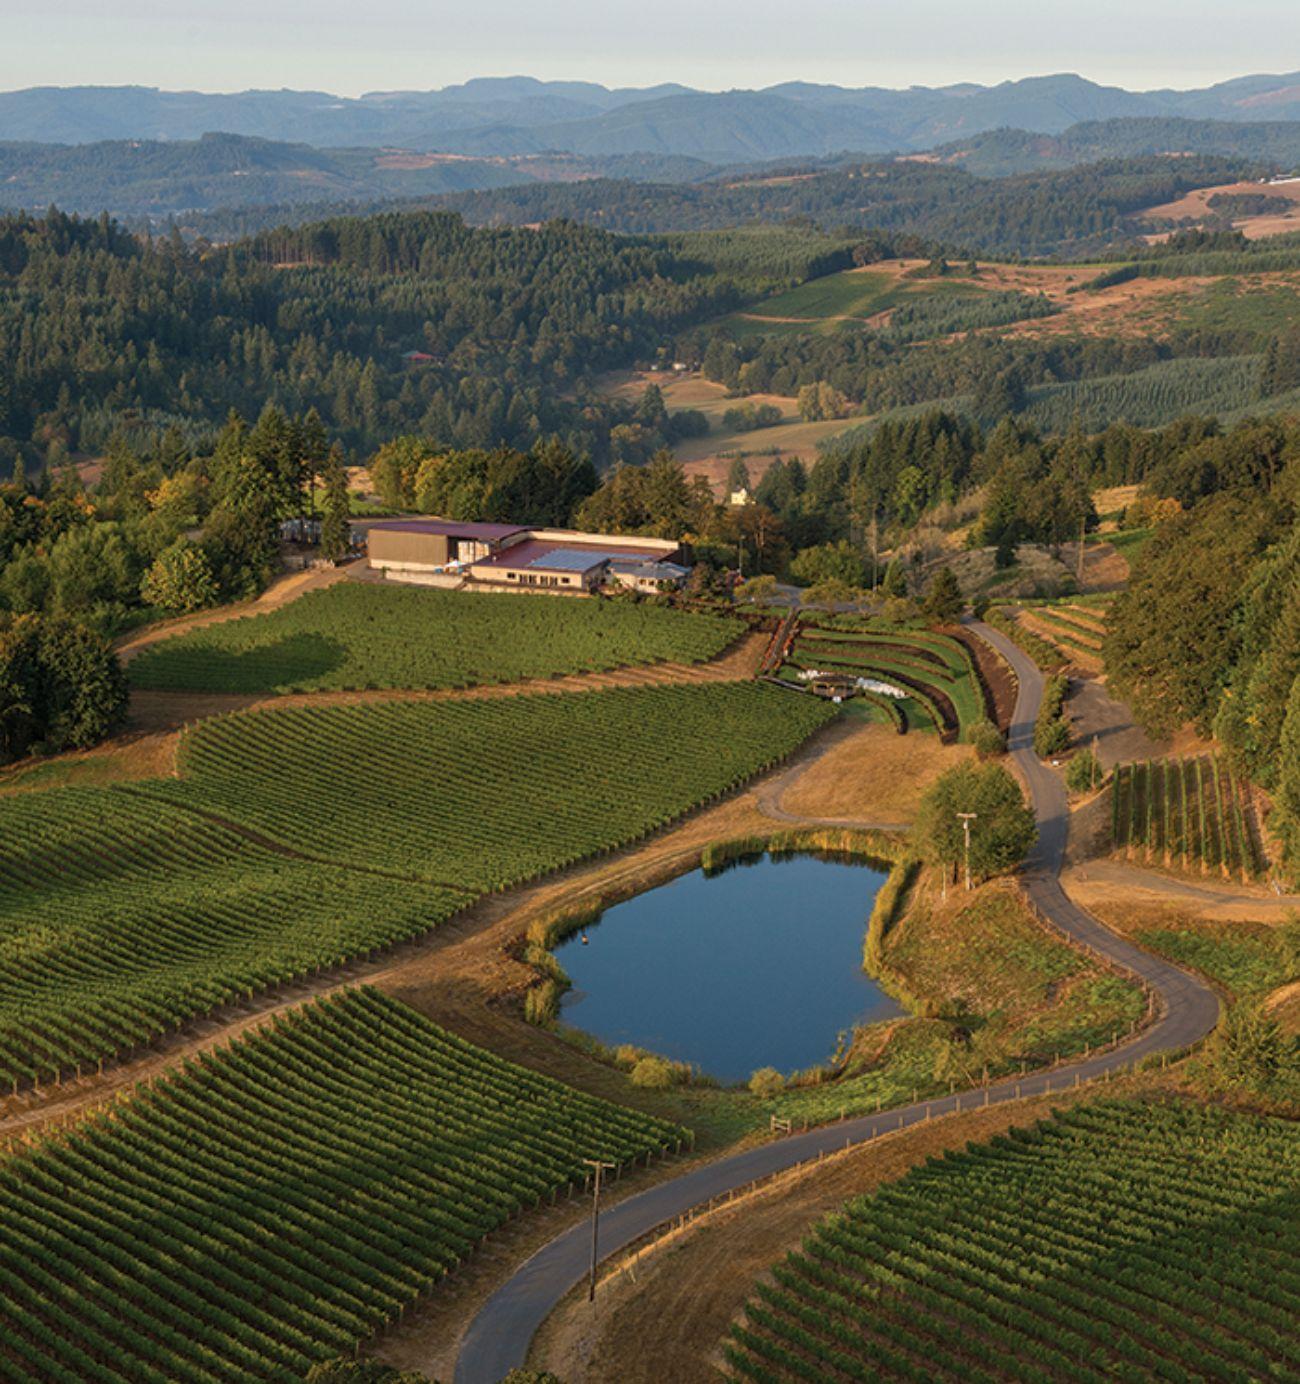 Aerial shot of Elk Cover vineyards near Yamhill-Carlton